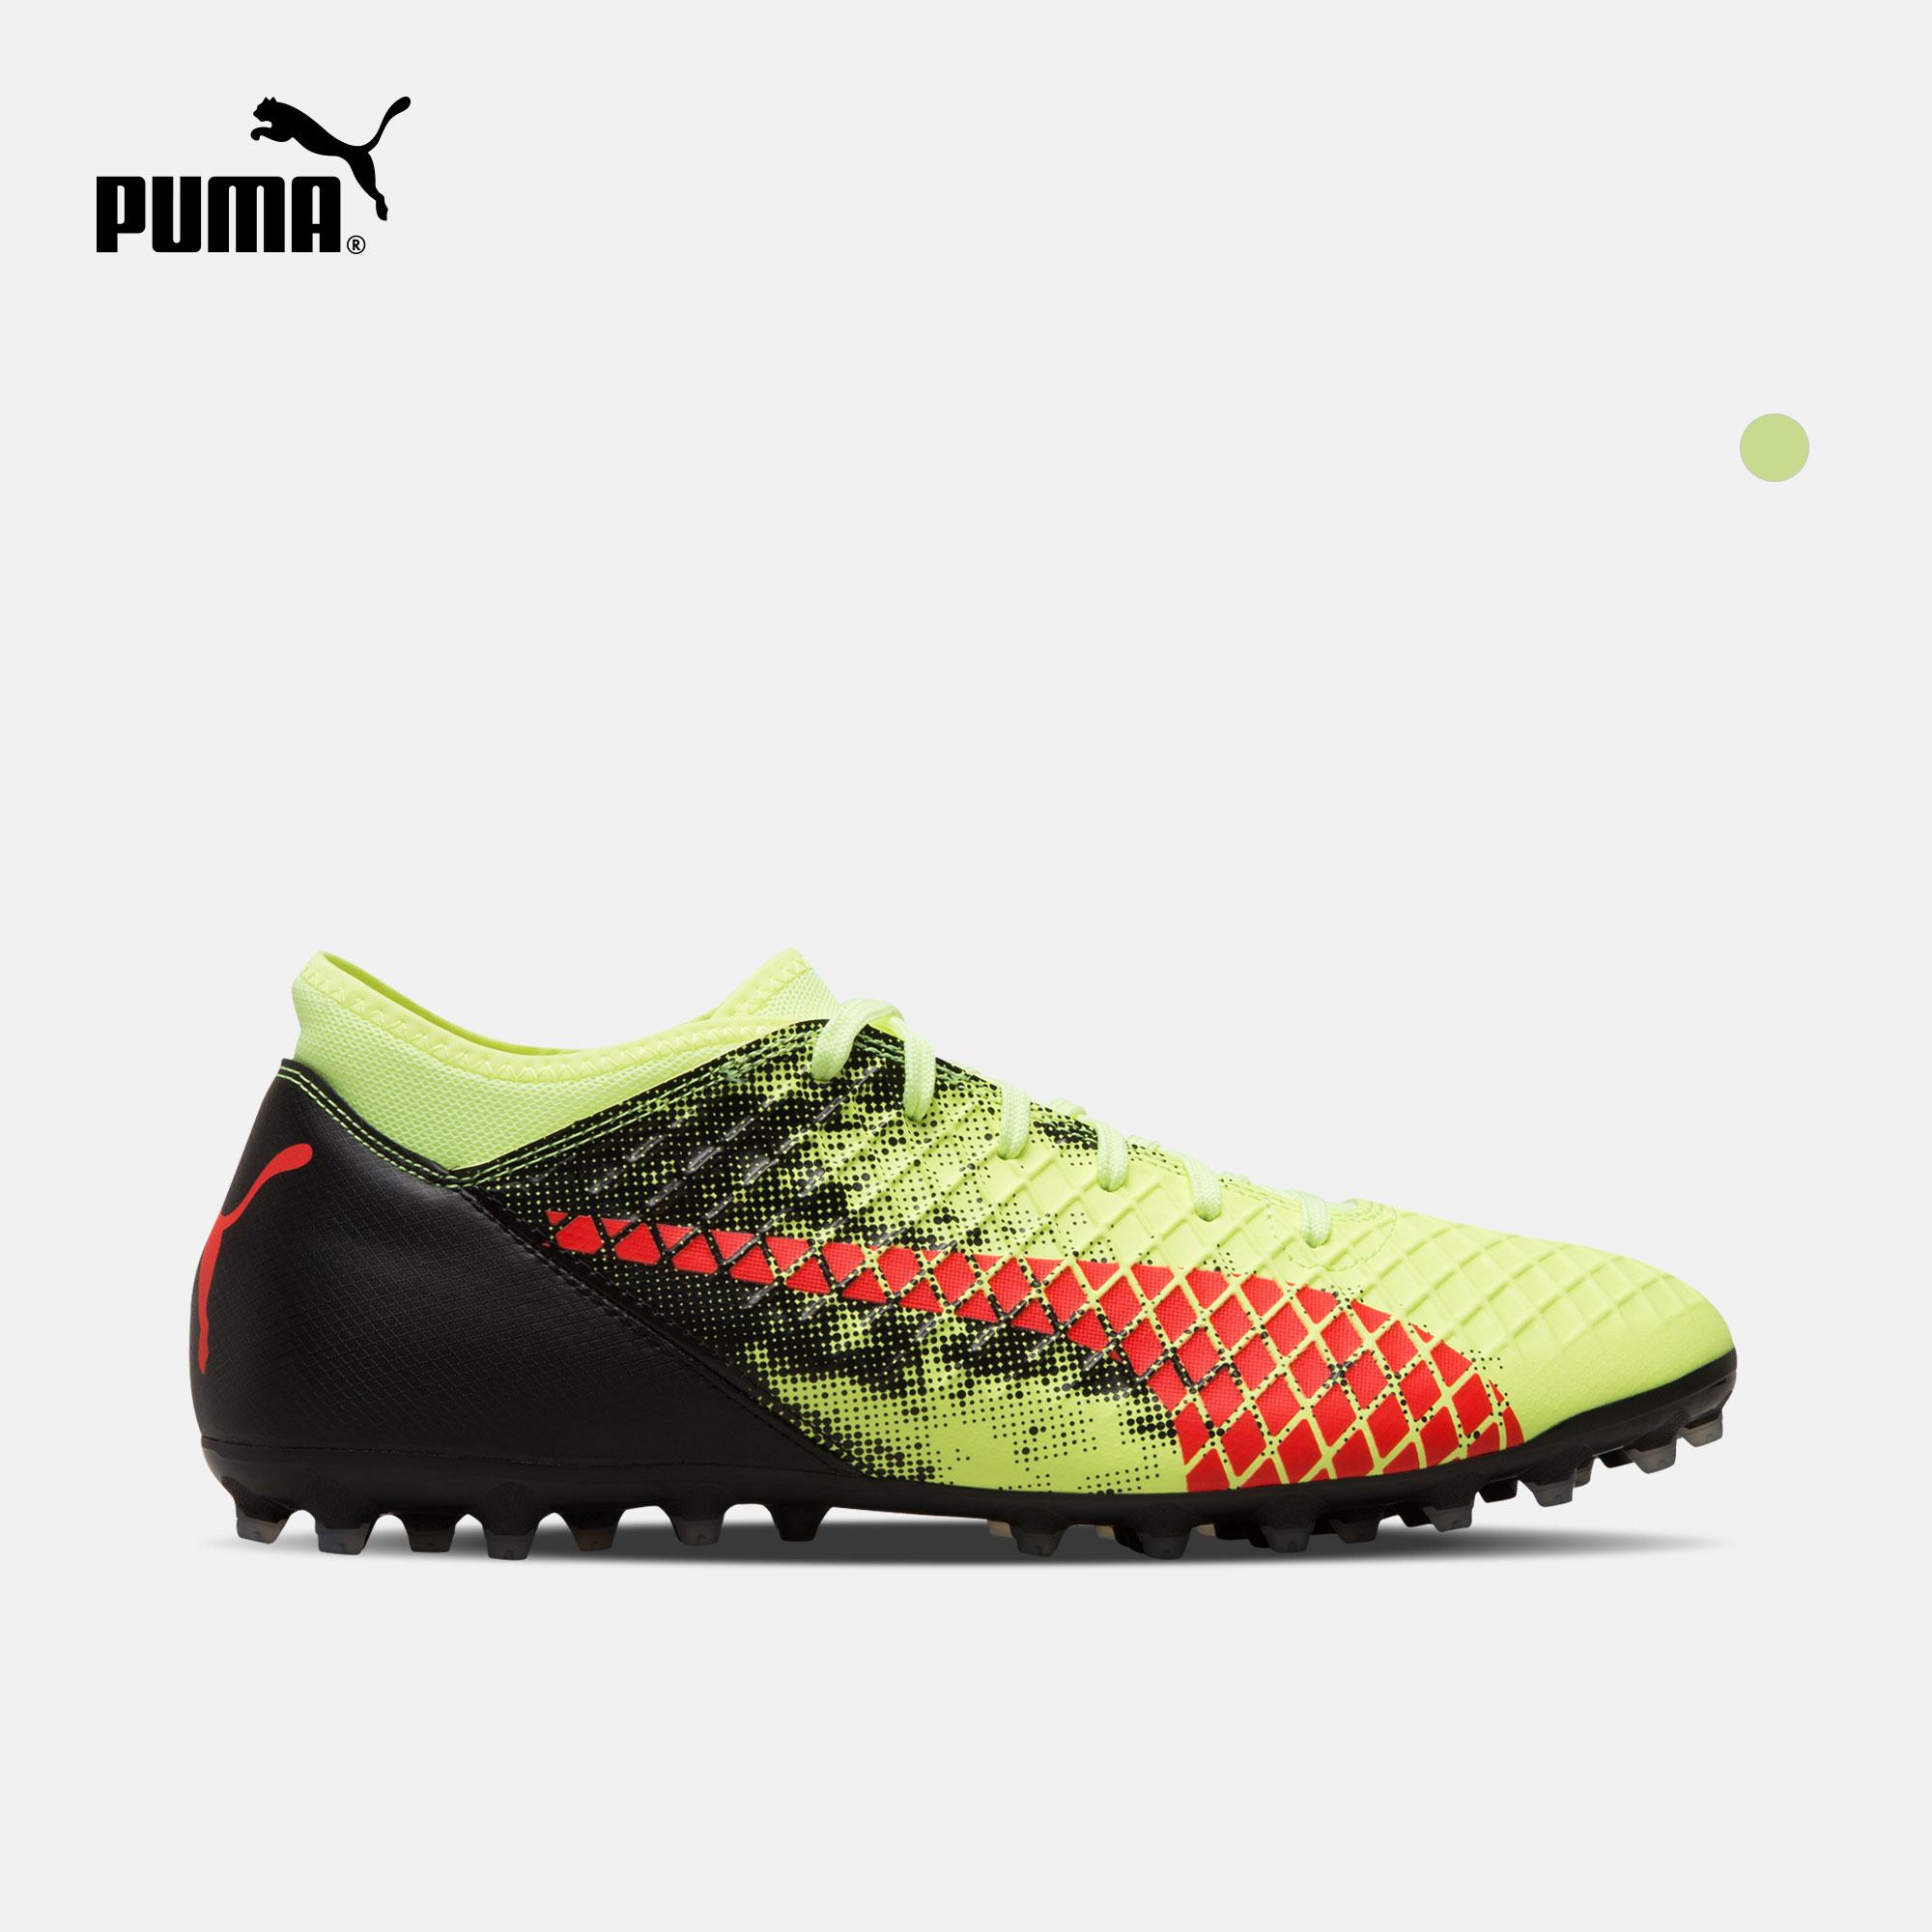 PUMA彪马官方 男子足球鞋 FUTURE 18.4 MG 104341